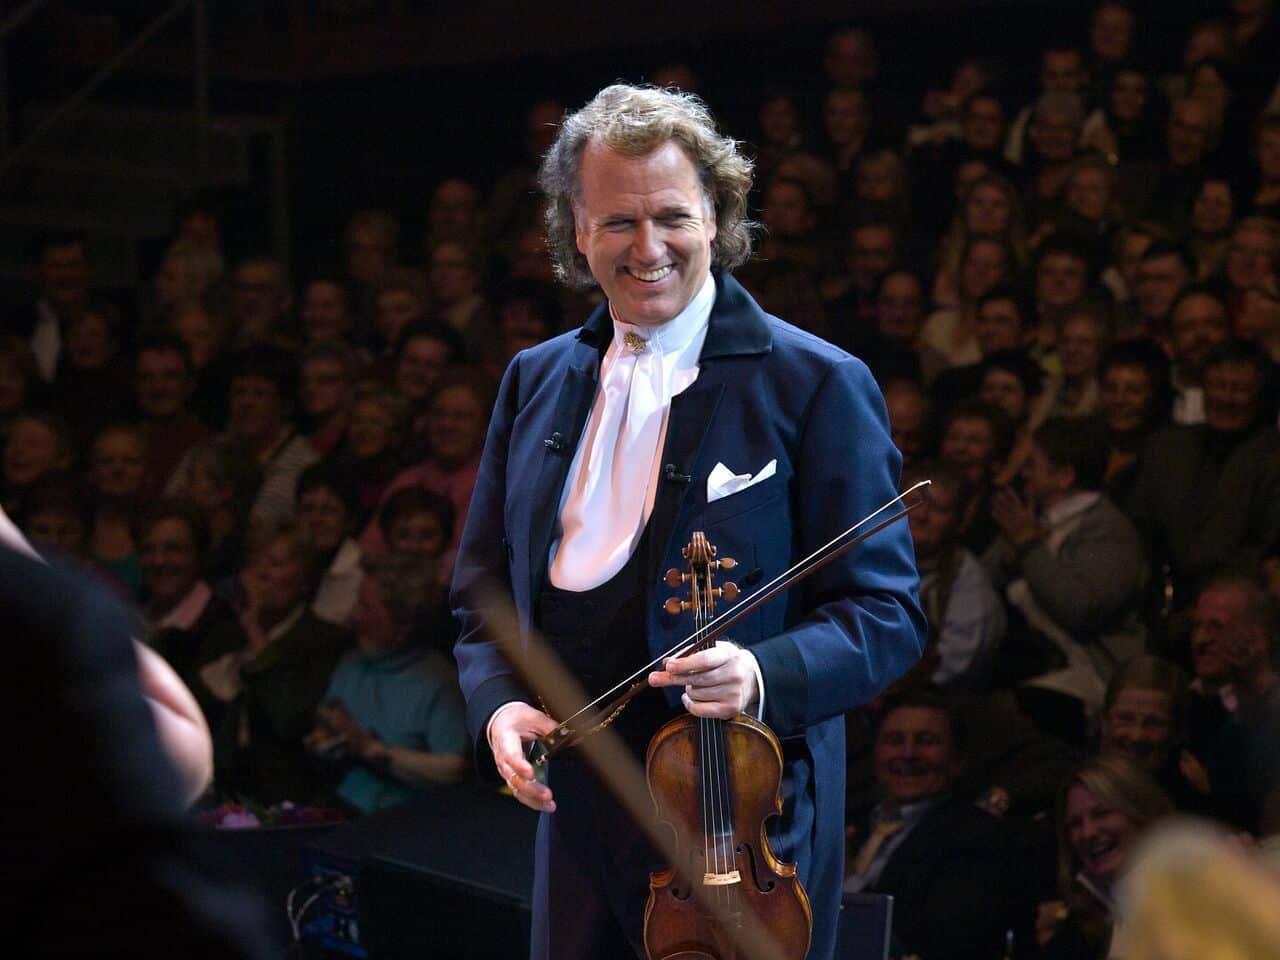 Andrew Rieu Concert Review